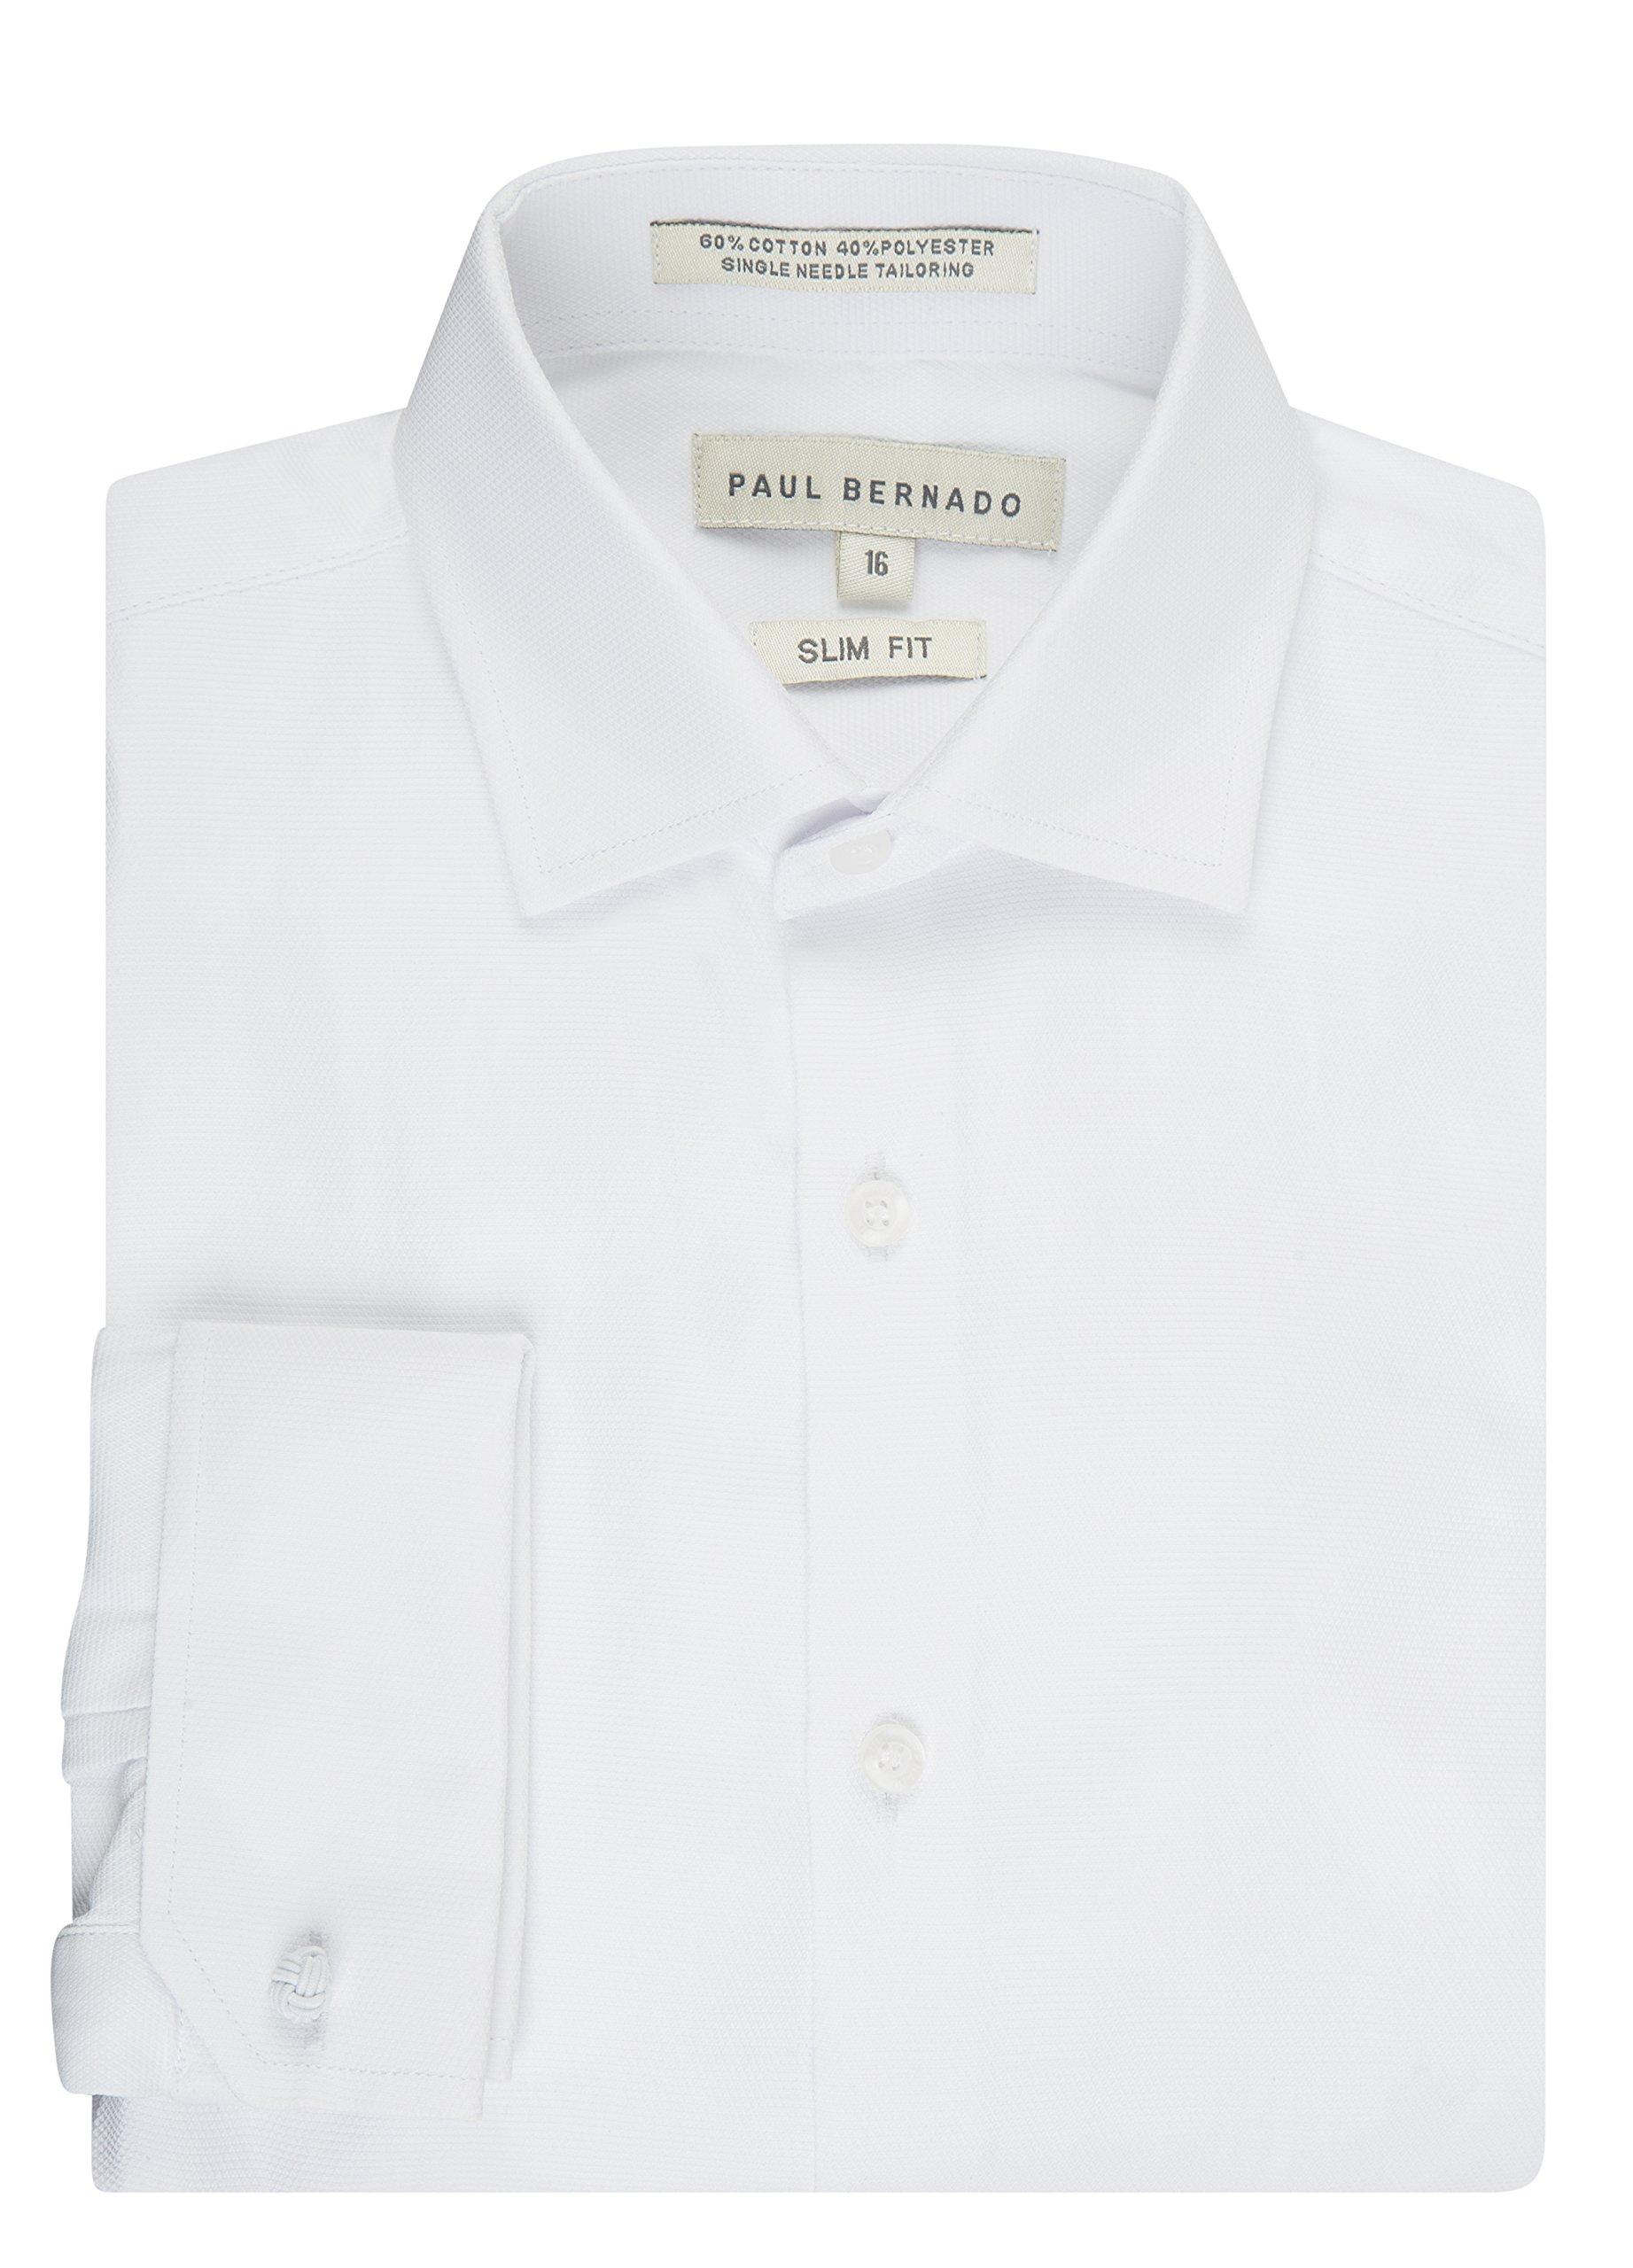 Paul Bernado Boy's 2205SLFC Slim Fit French Cuff Pique Design Dress Shirt - White - 20